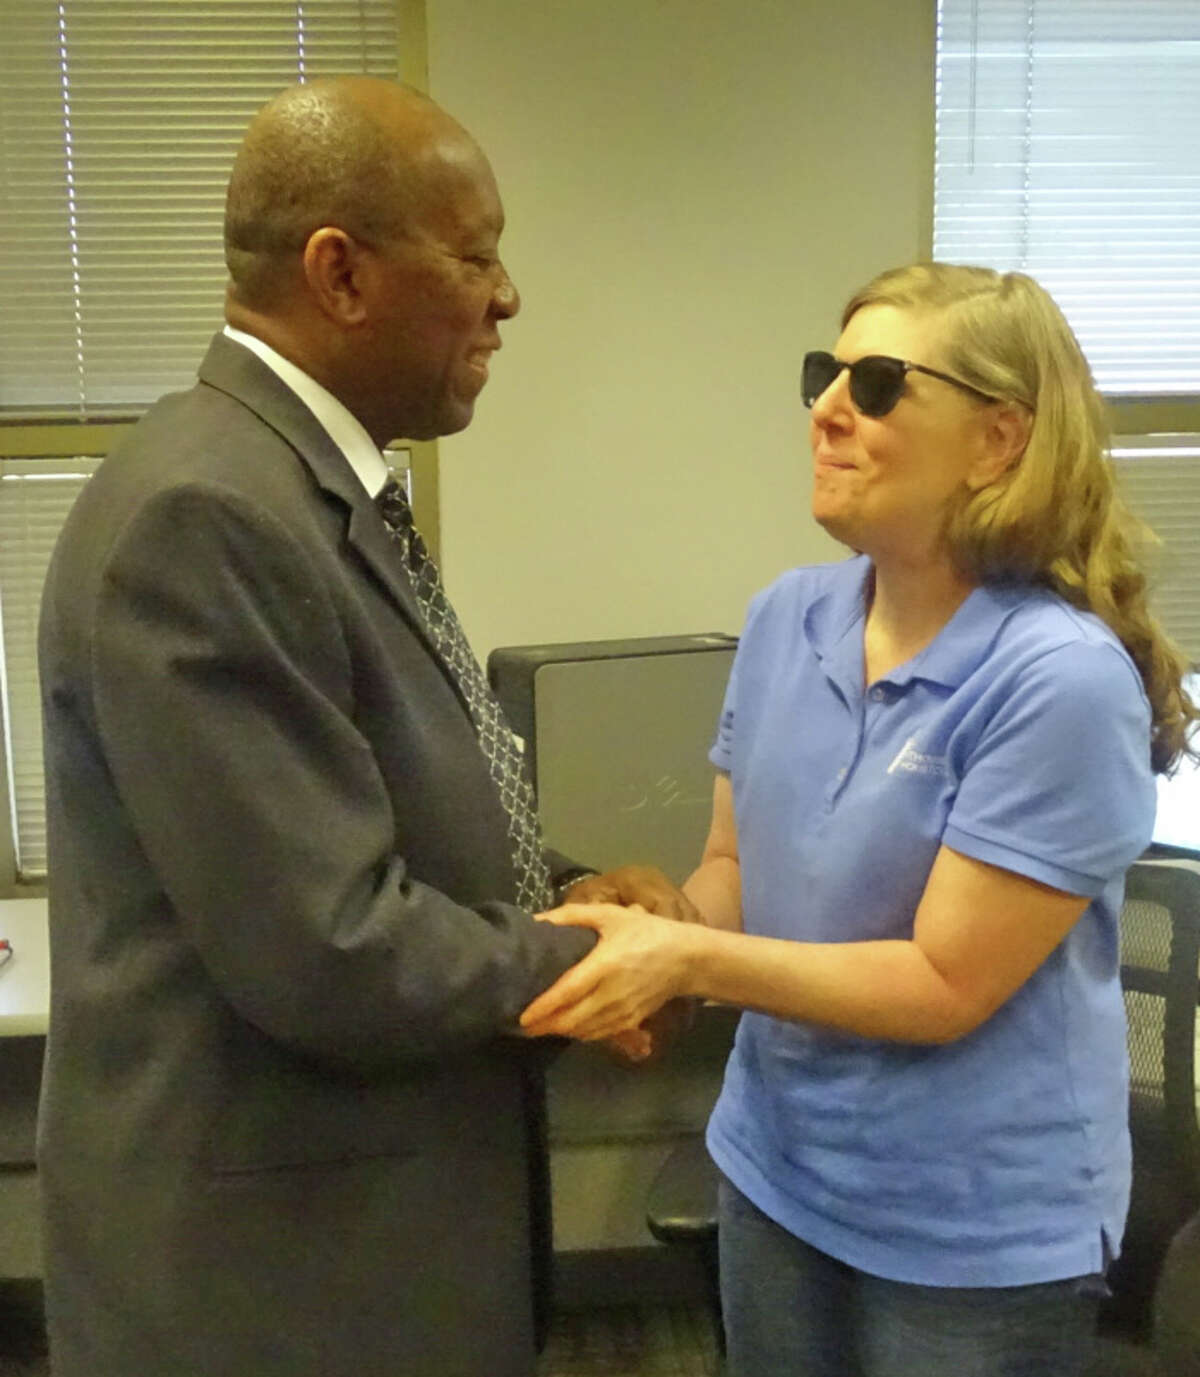 HoustonMayor Sylvester Turner visits with Lisa Carpenter, who works as a medical transcriptionist at The Lighthouse of Houston.